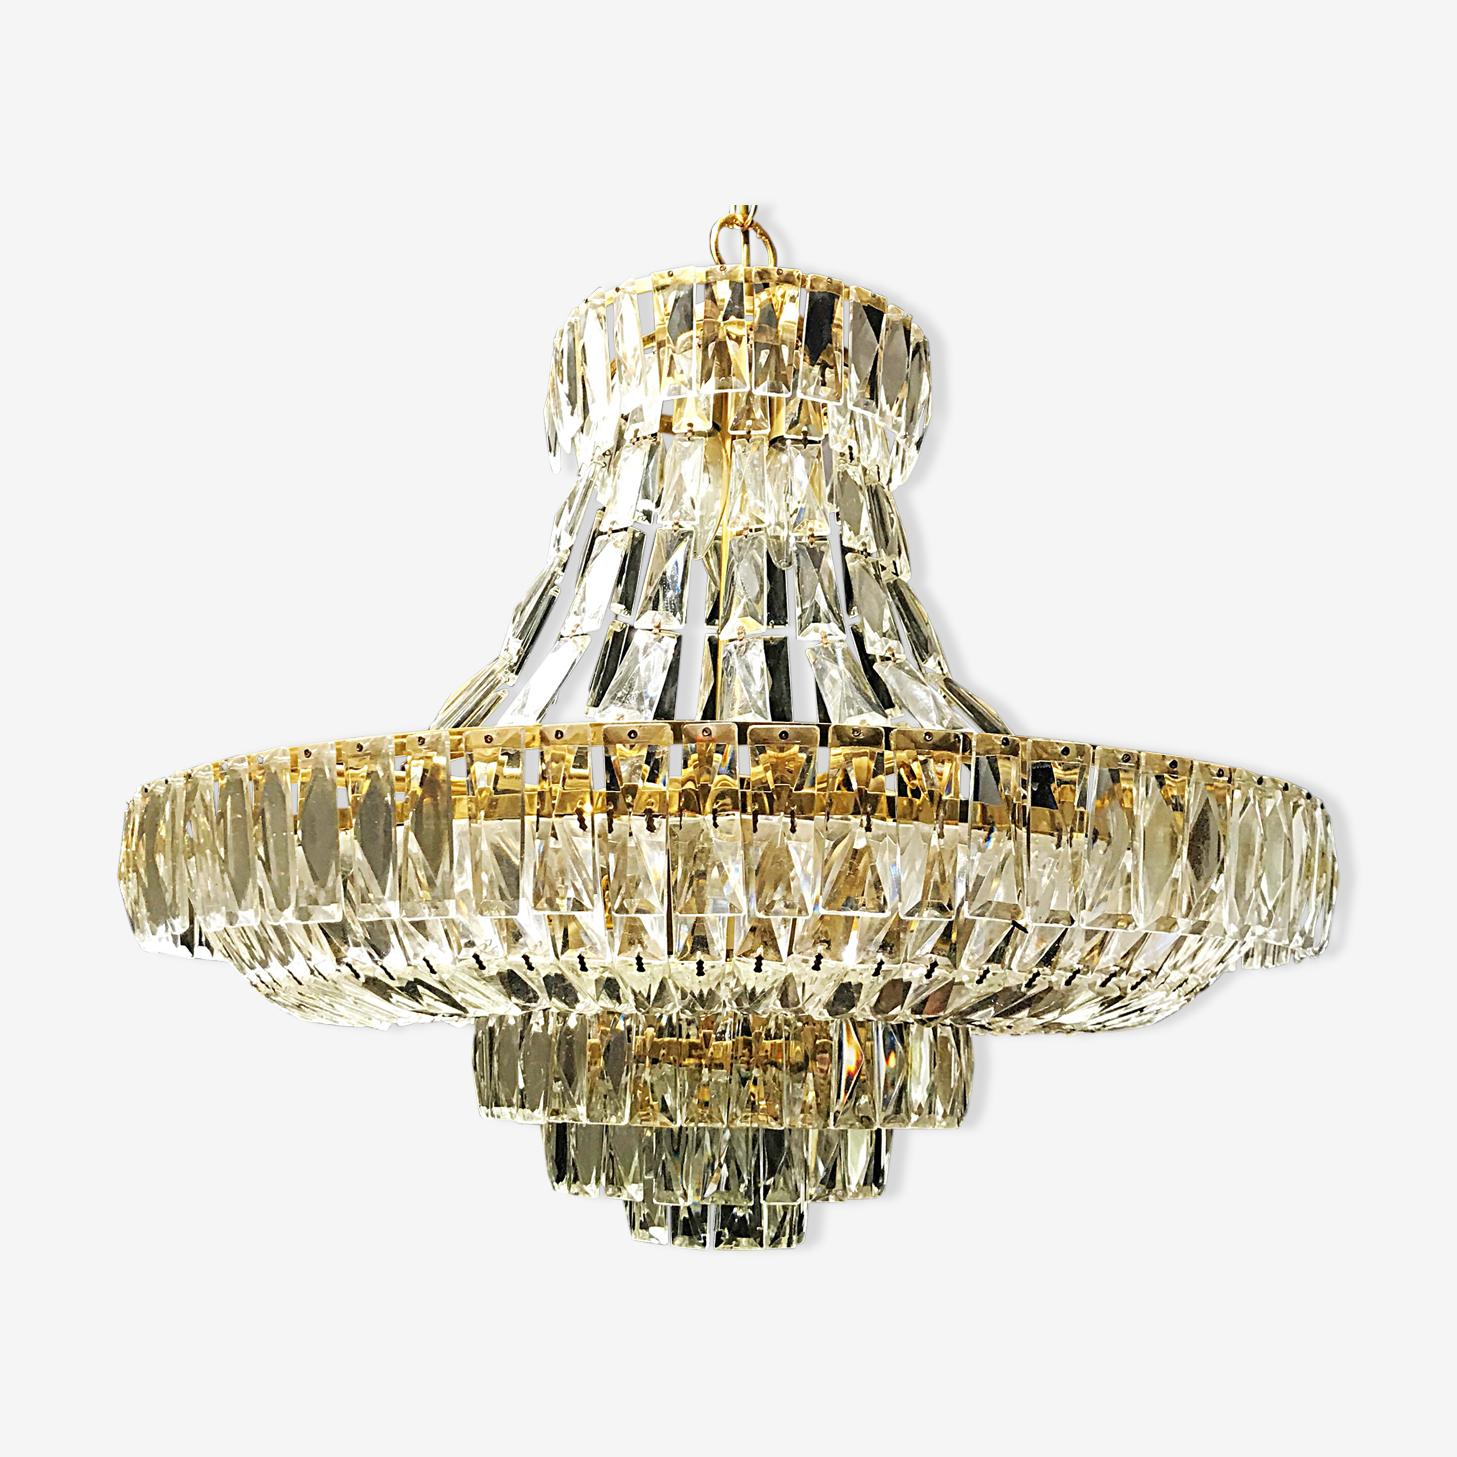 Murano crystal chandelier 1970